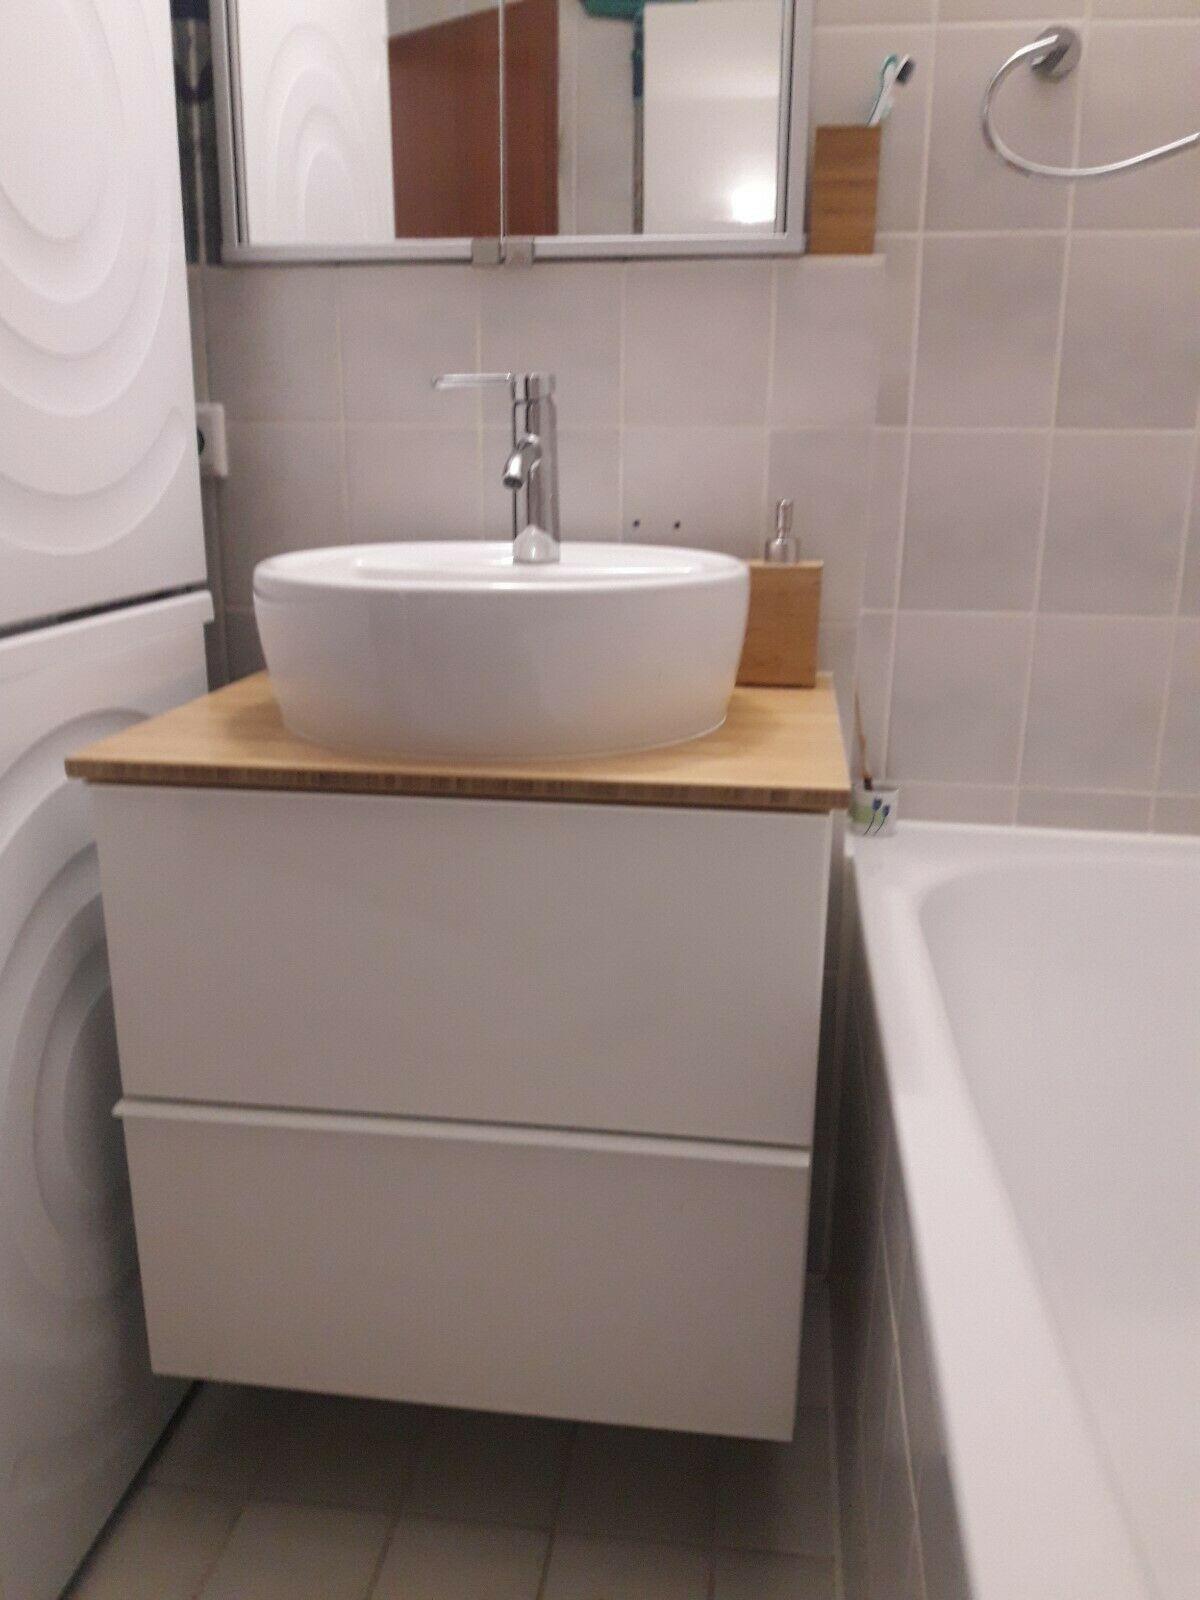 IKEA GODMORGON WASCHBECKENUNTERSCHRANK 62x49x74 godmorgon ...